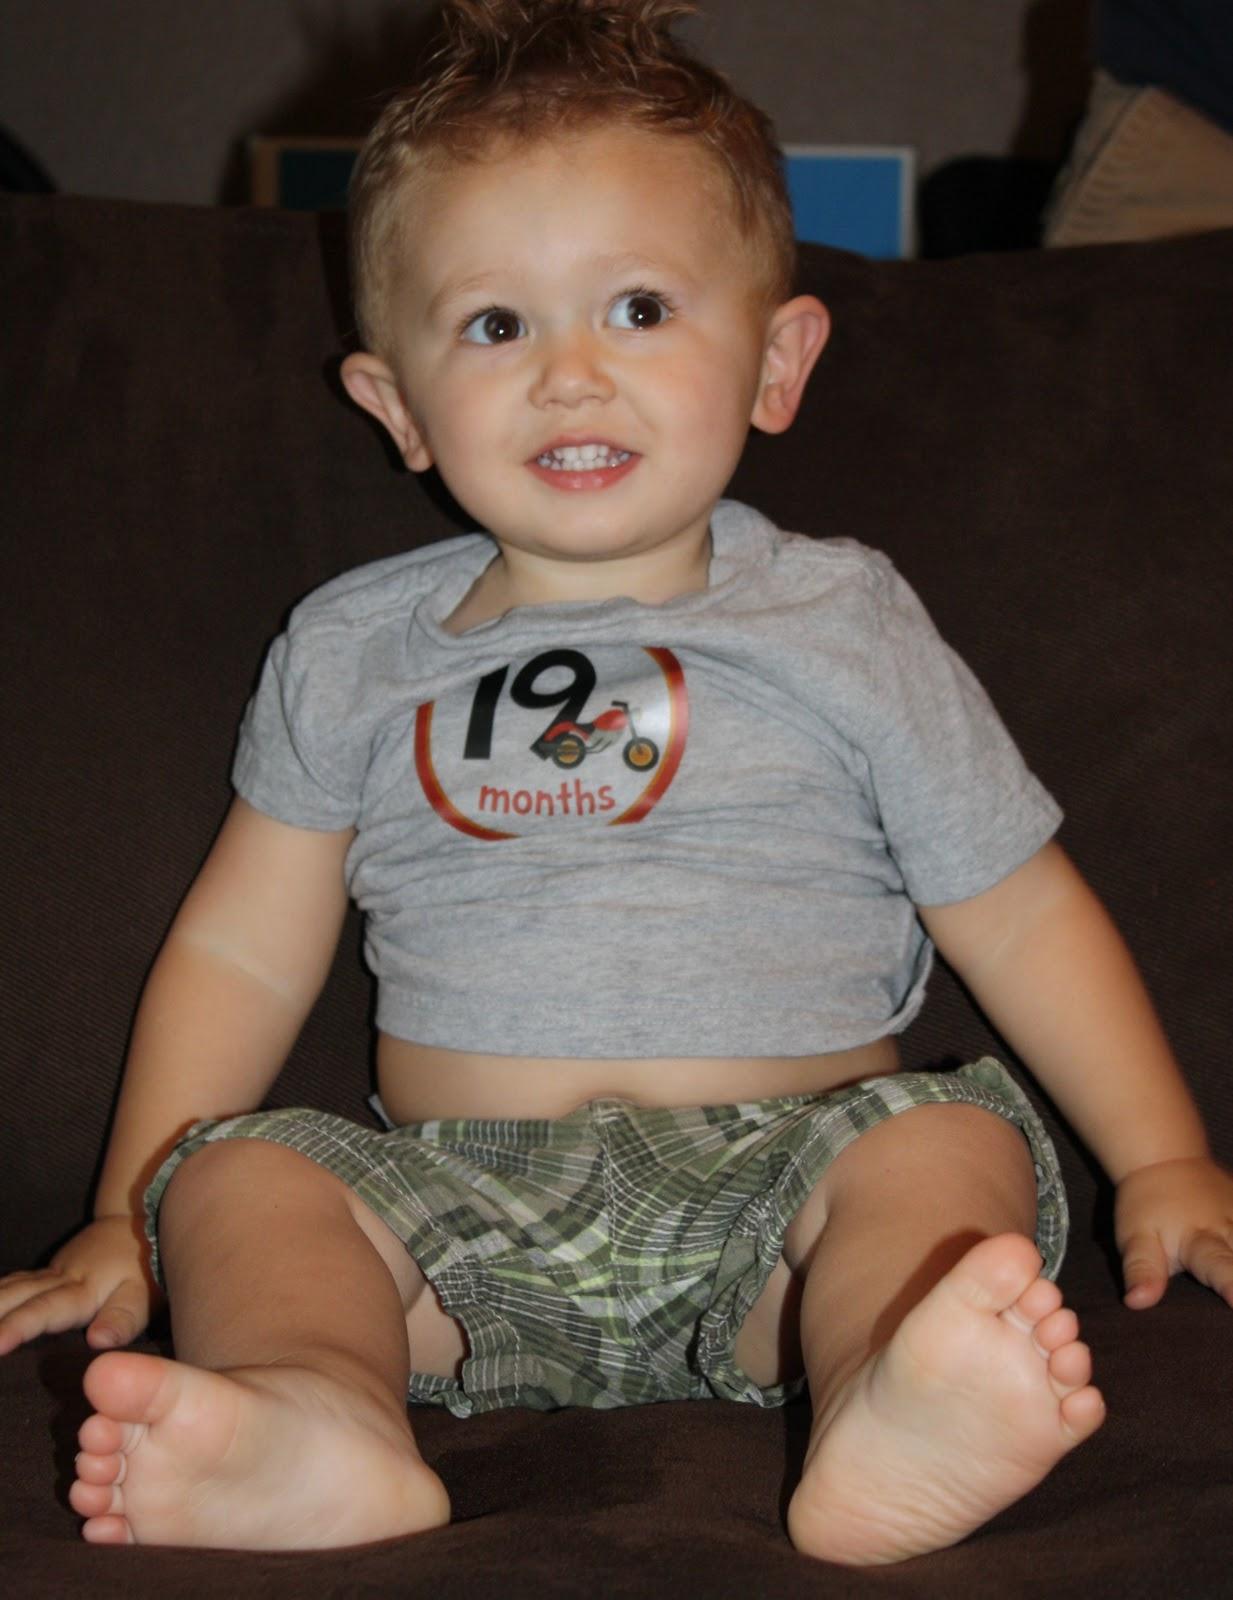 Baby McDermott: 18 & 19 Months Old